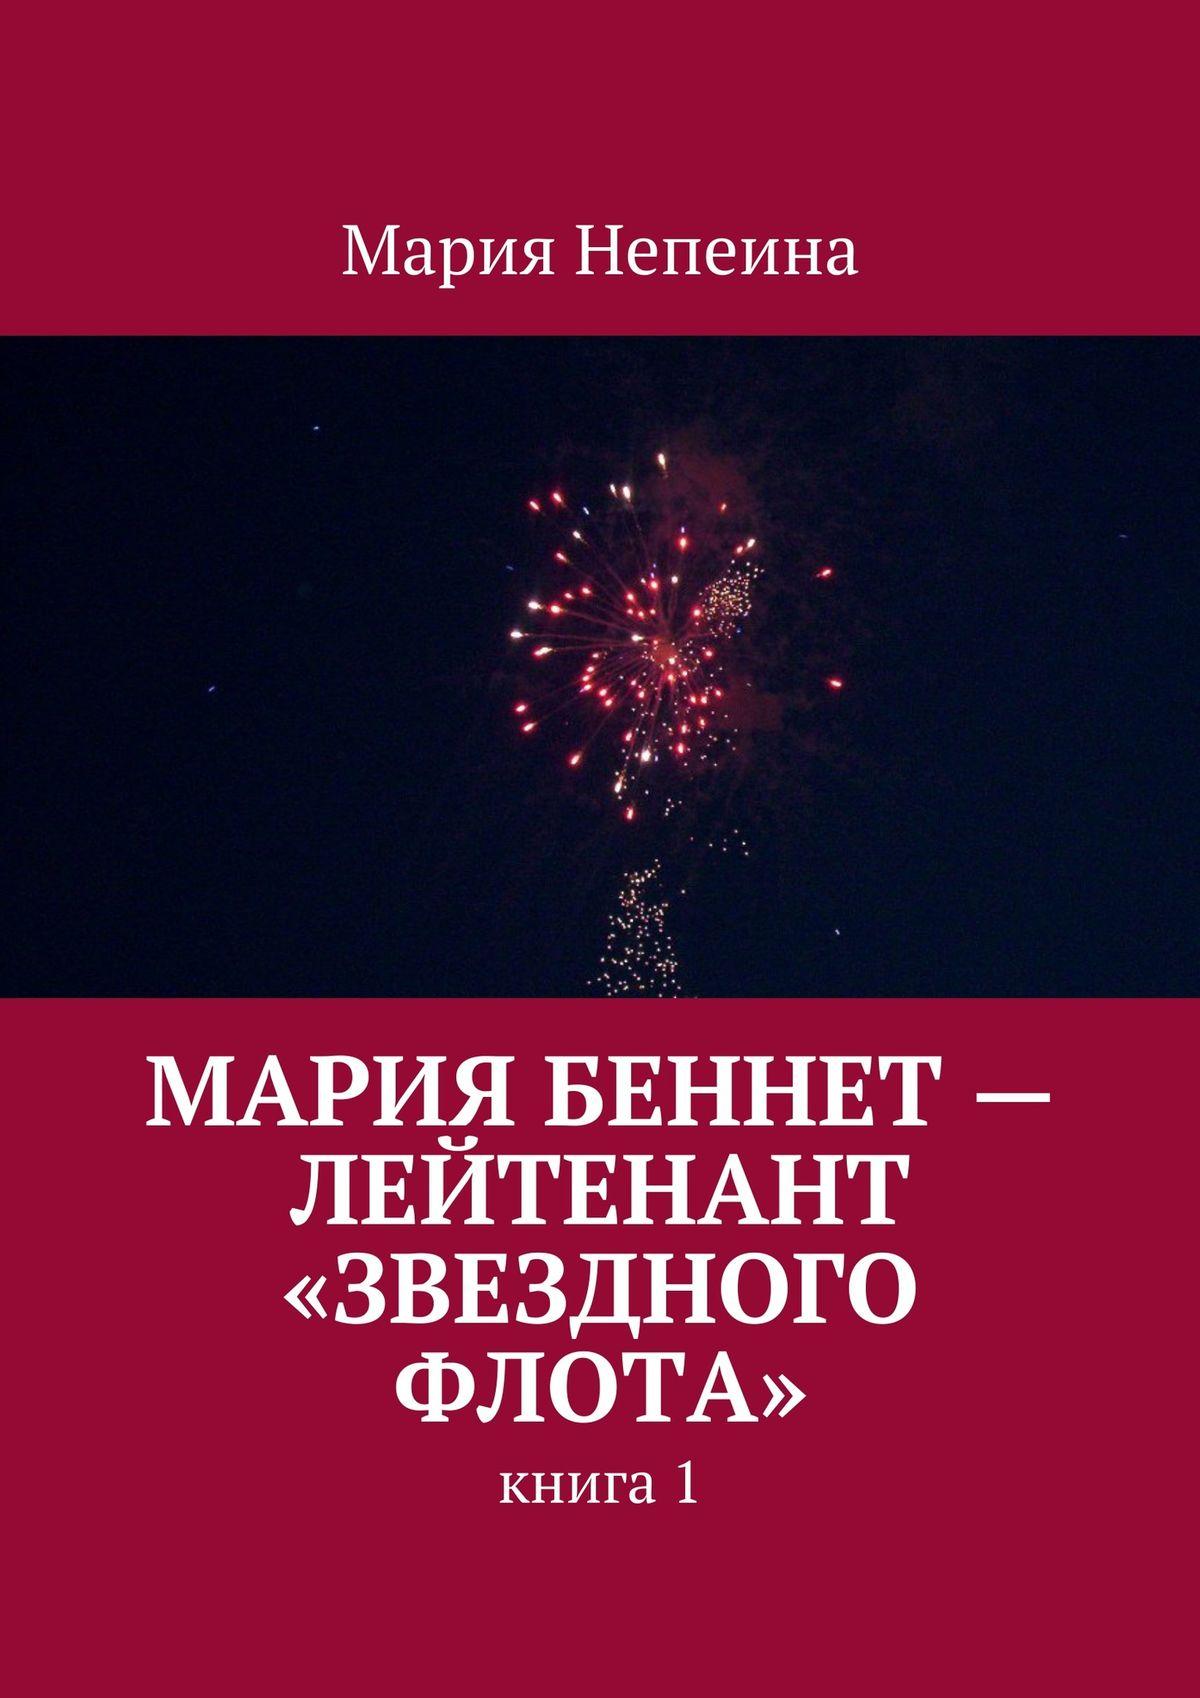 Мария Непеина Мария Беннет– лейтенант «Звездного флота» мария непеина мария беннет в звездном флоте книга 1 эпизод 1 в плену у памяти